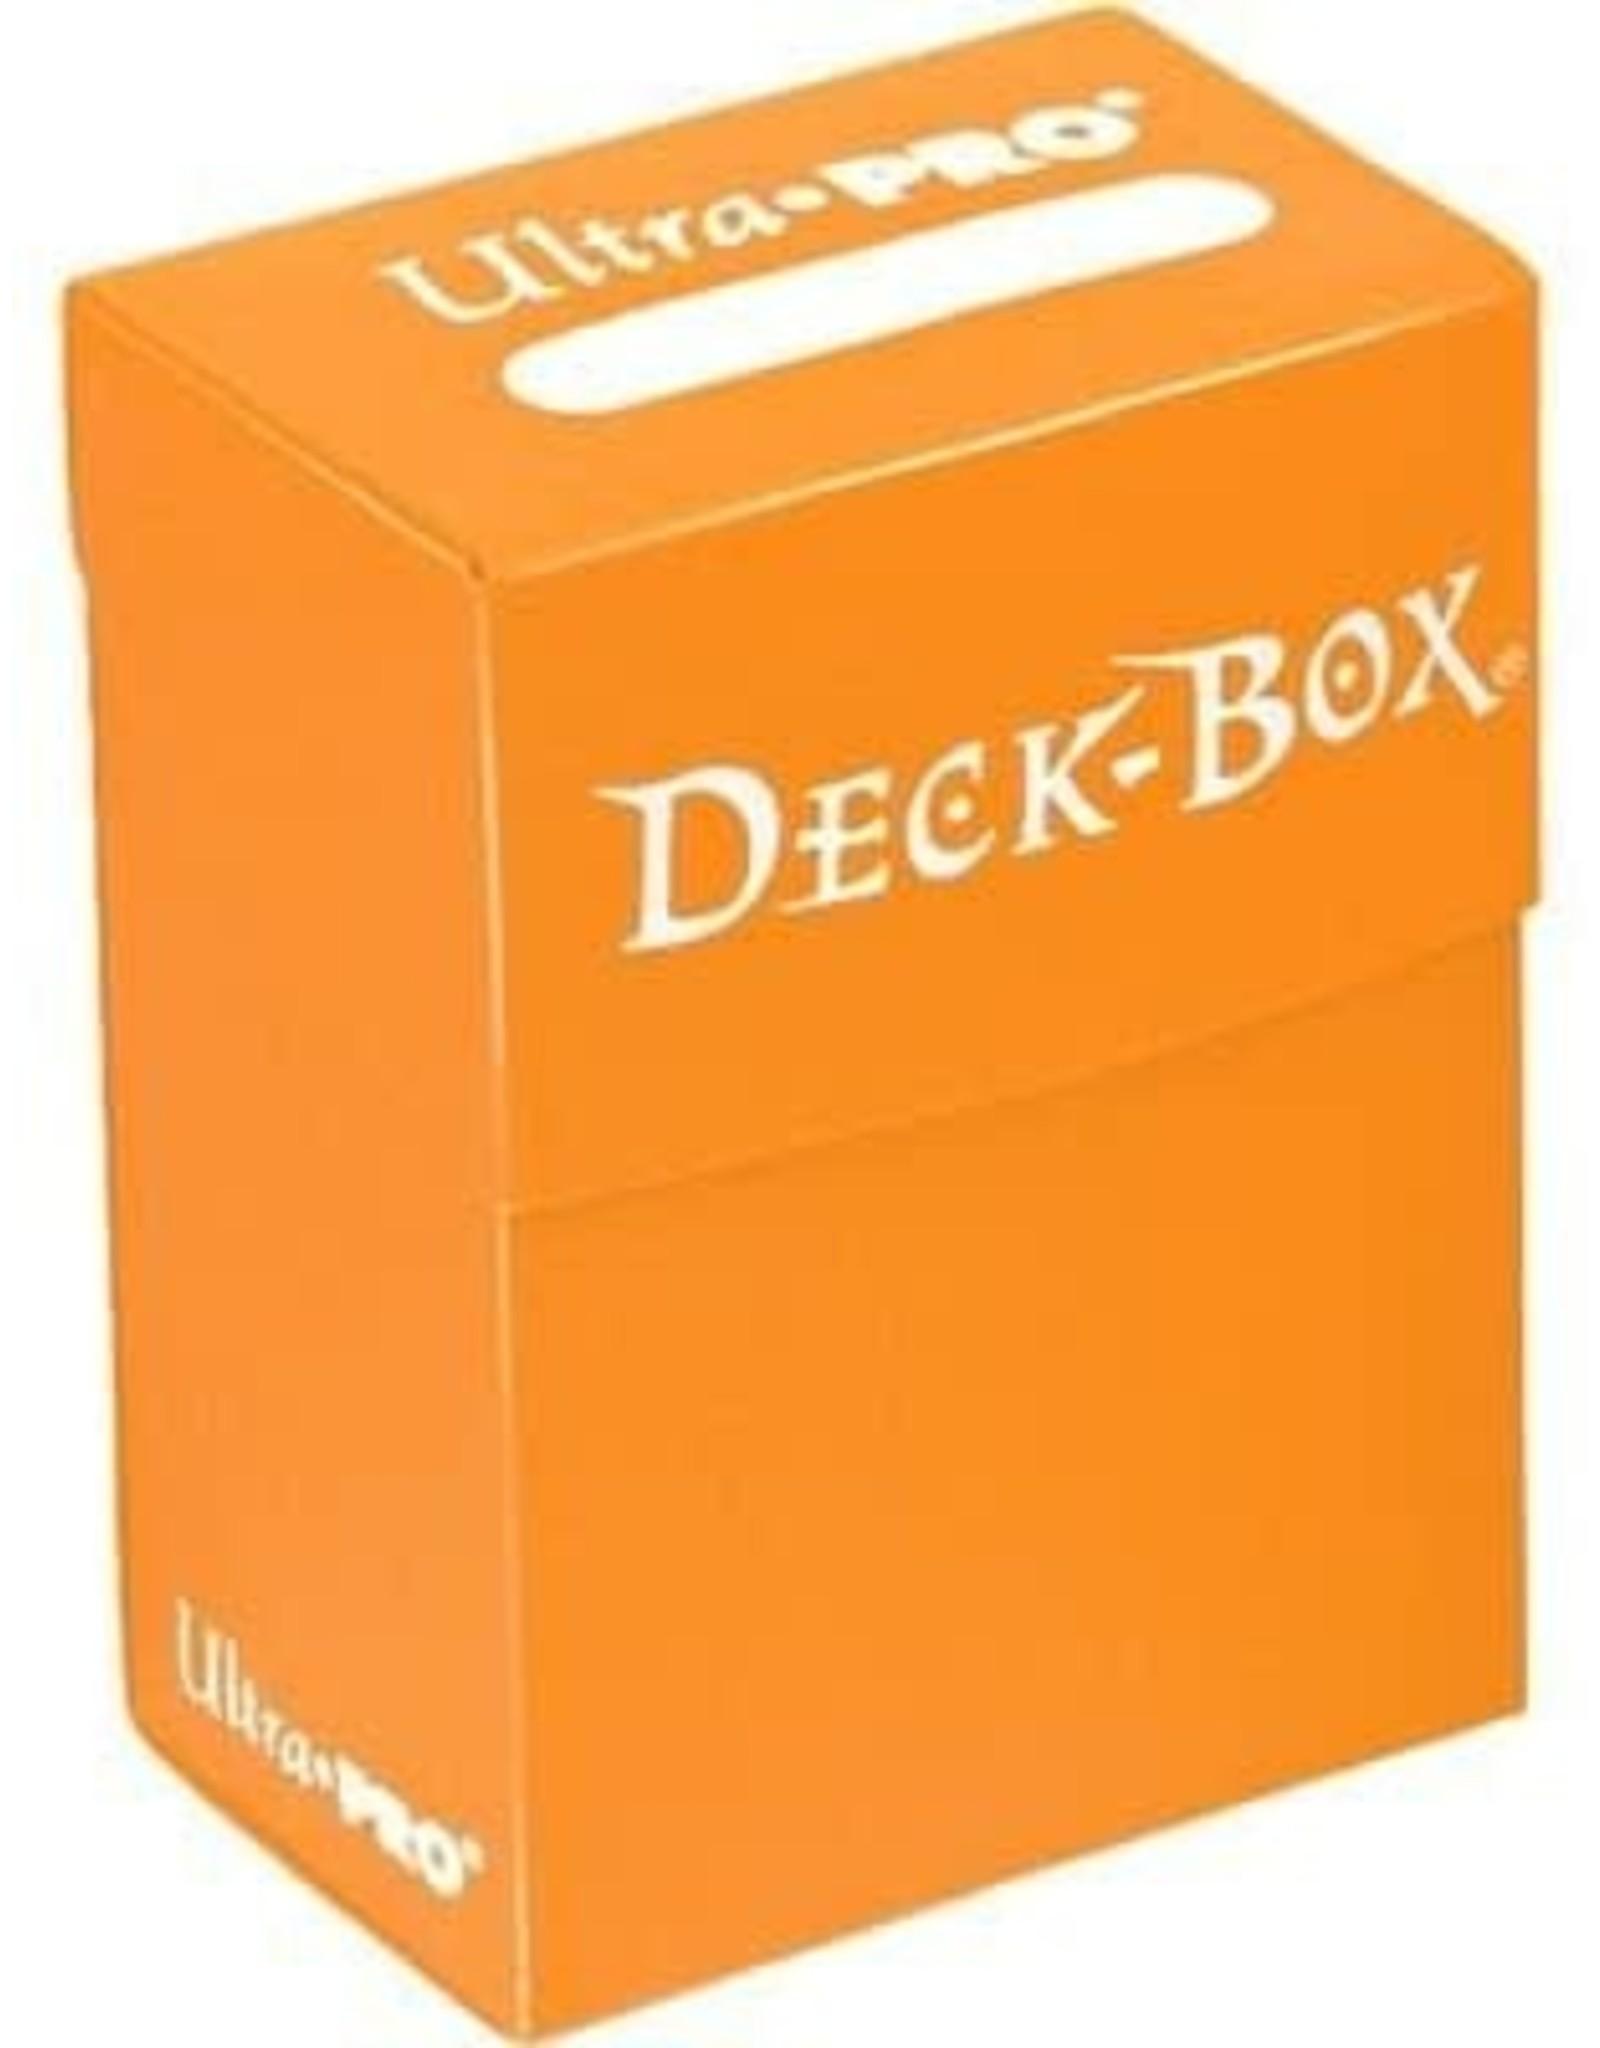 Ultra Pro Ultra Pro: Pumpkin Orange Deck Box